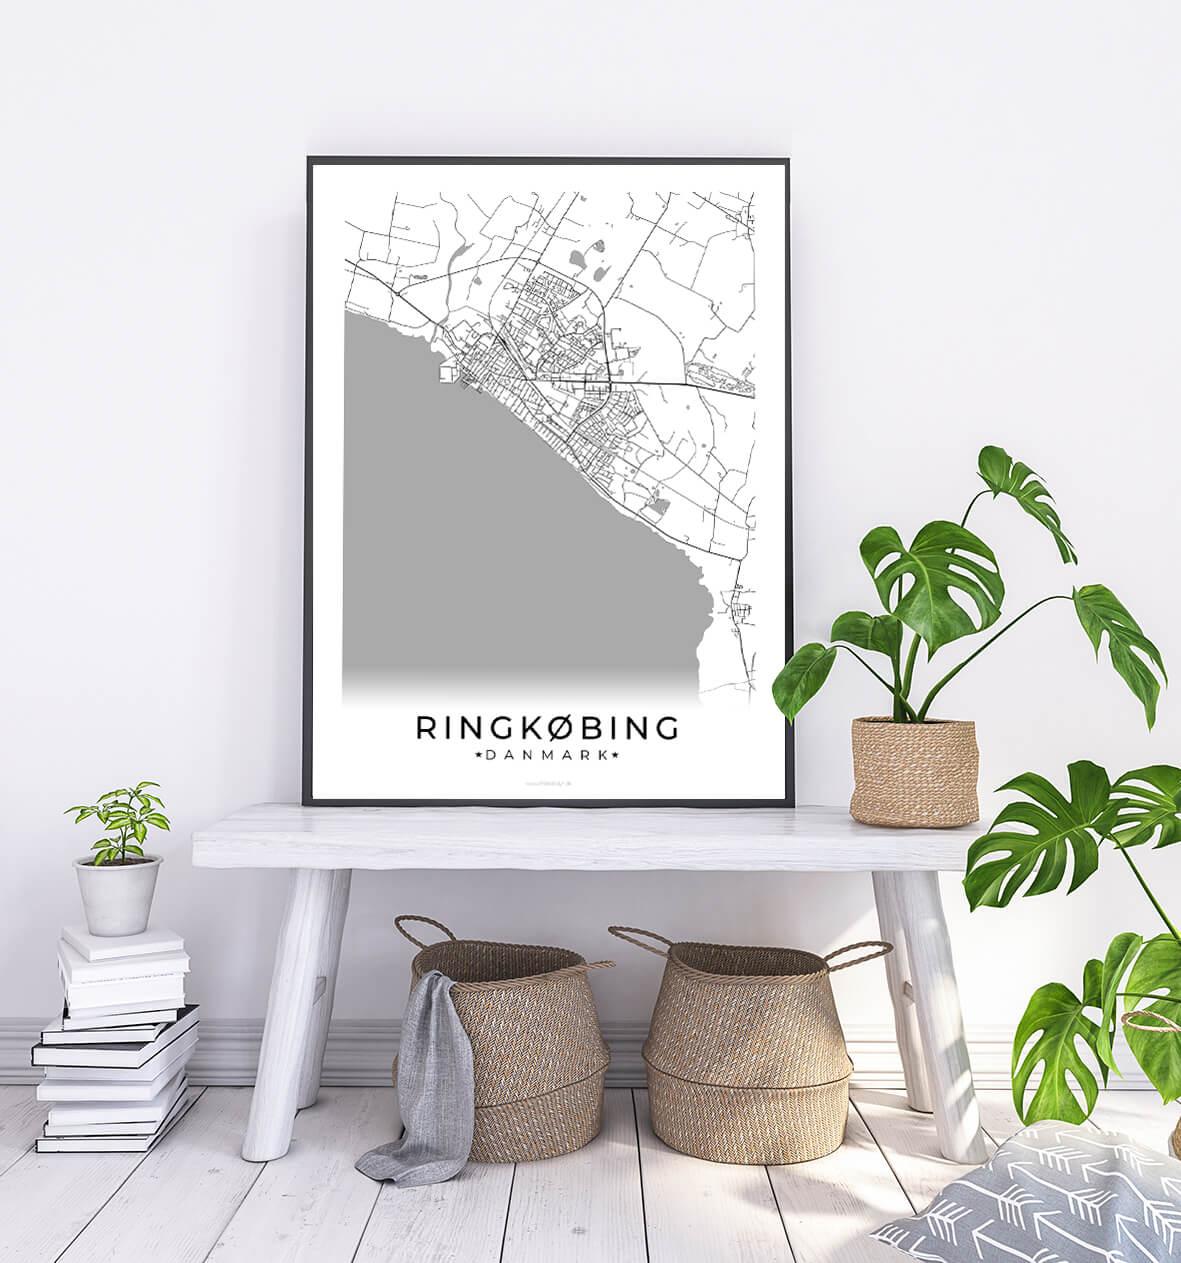 Ringkoebing-hvid-byplakat-1